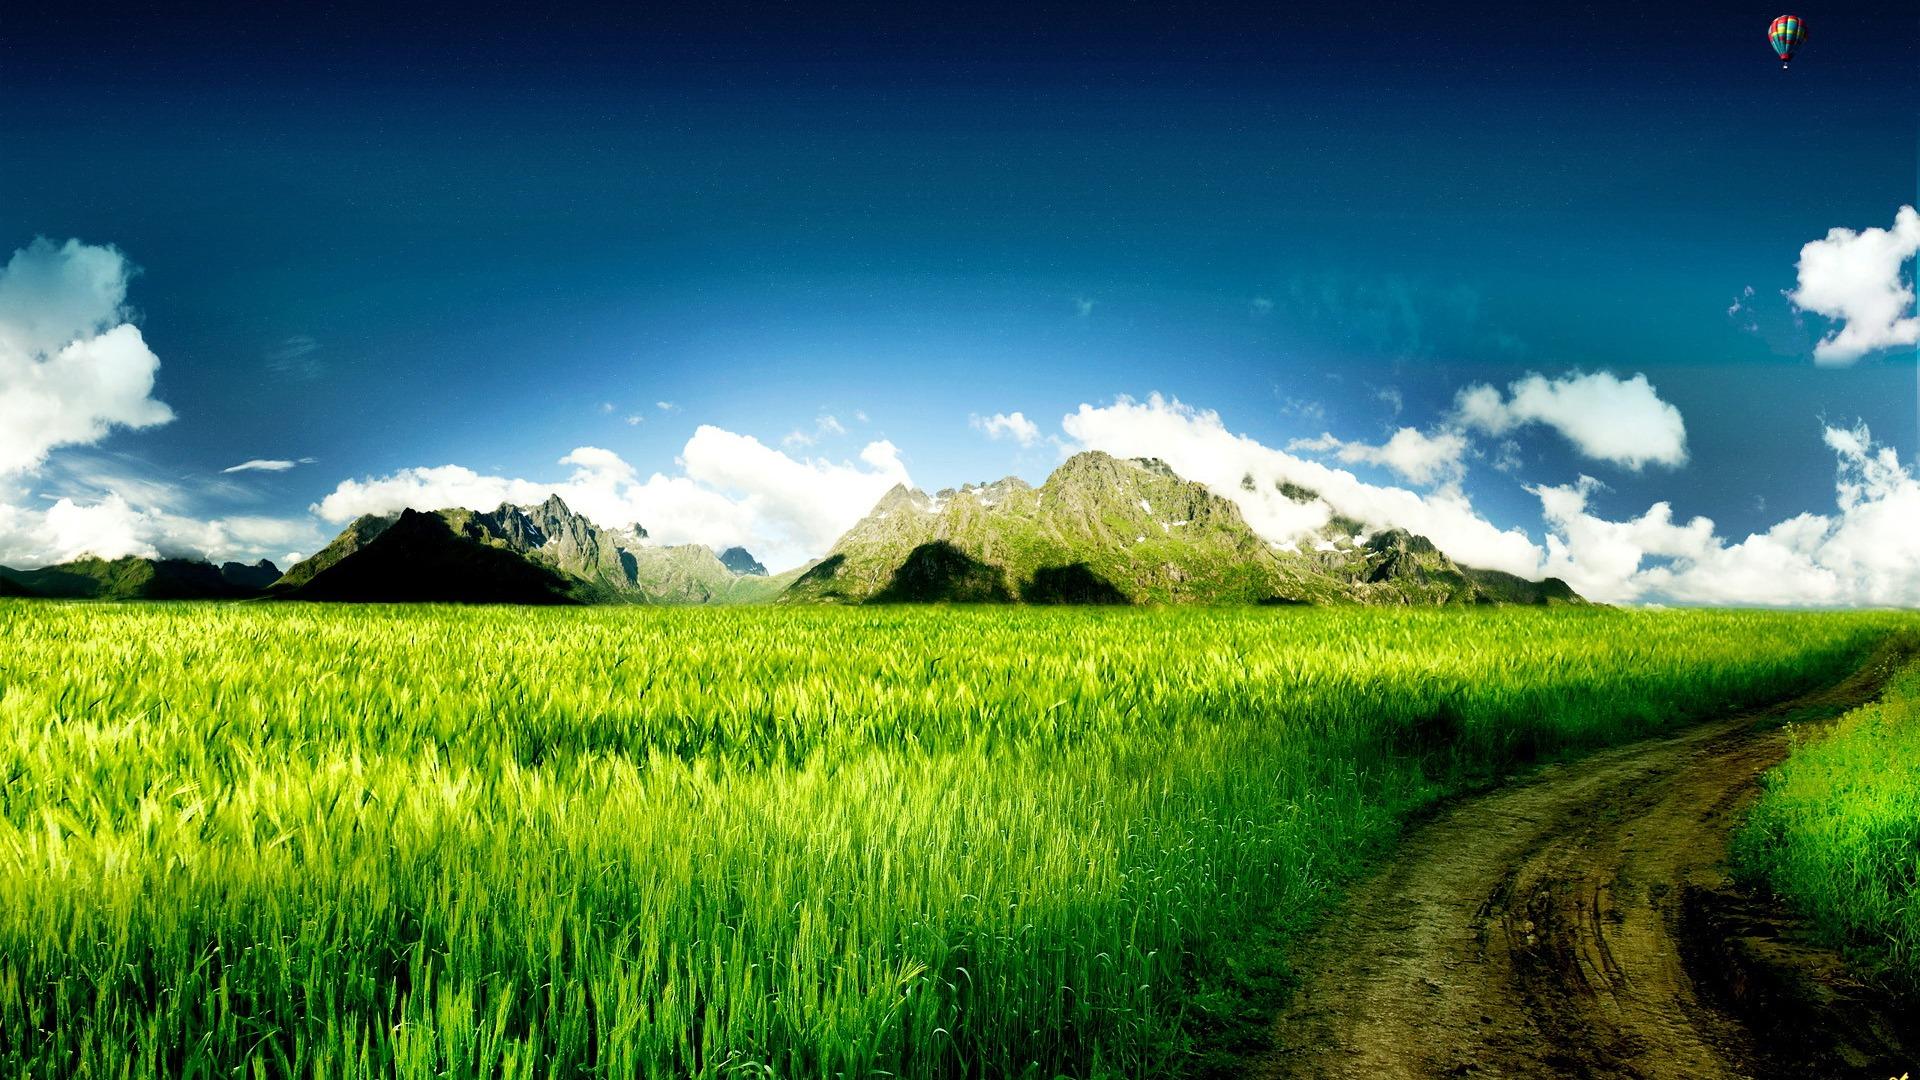 HD Widescreen Landscape Wallpapers 17   1920x1080 Wallpaper Download 1920x1080